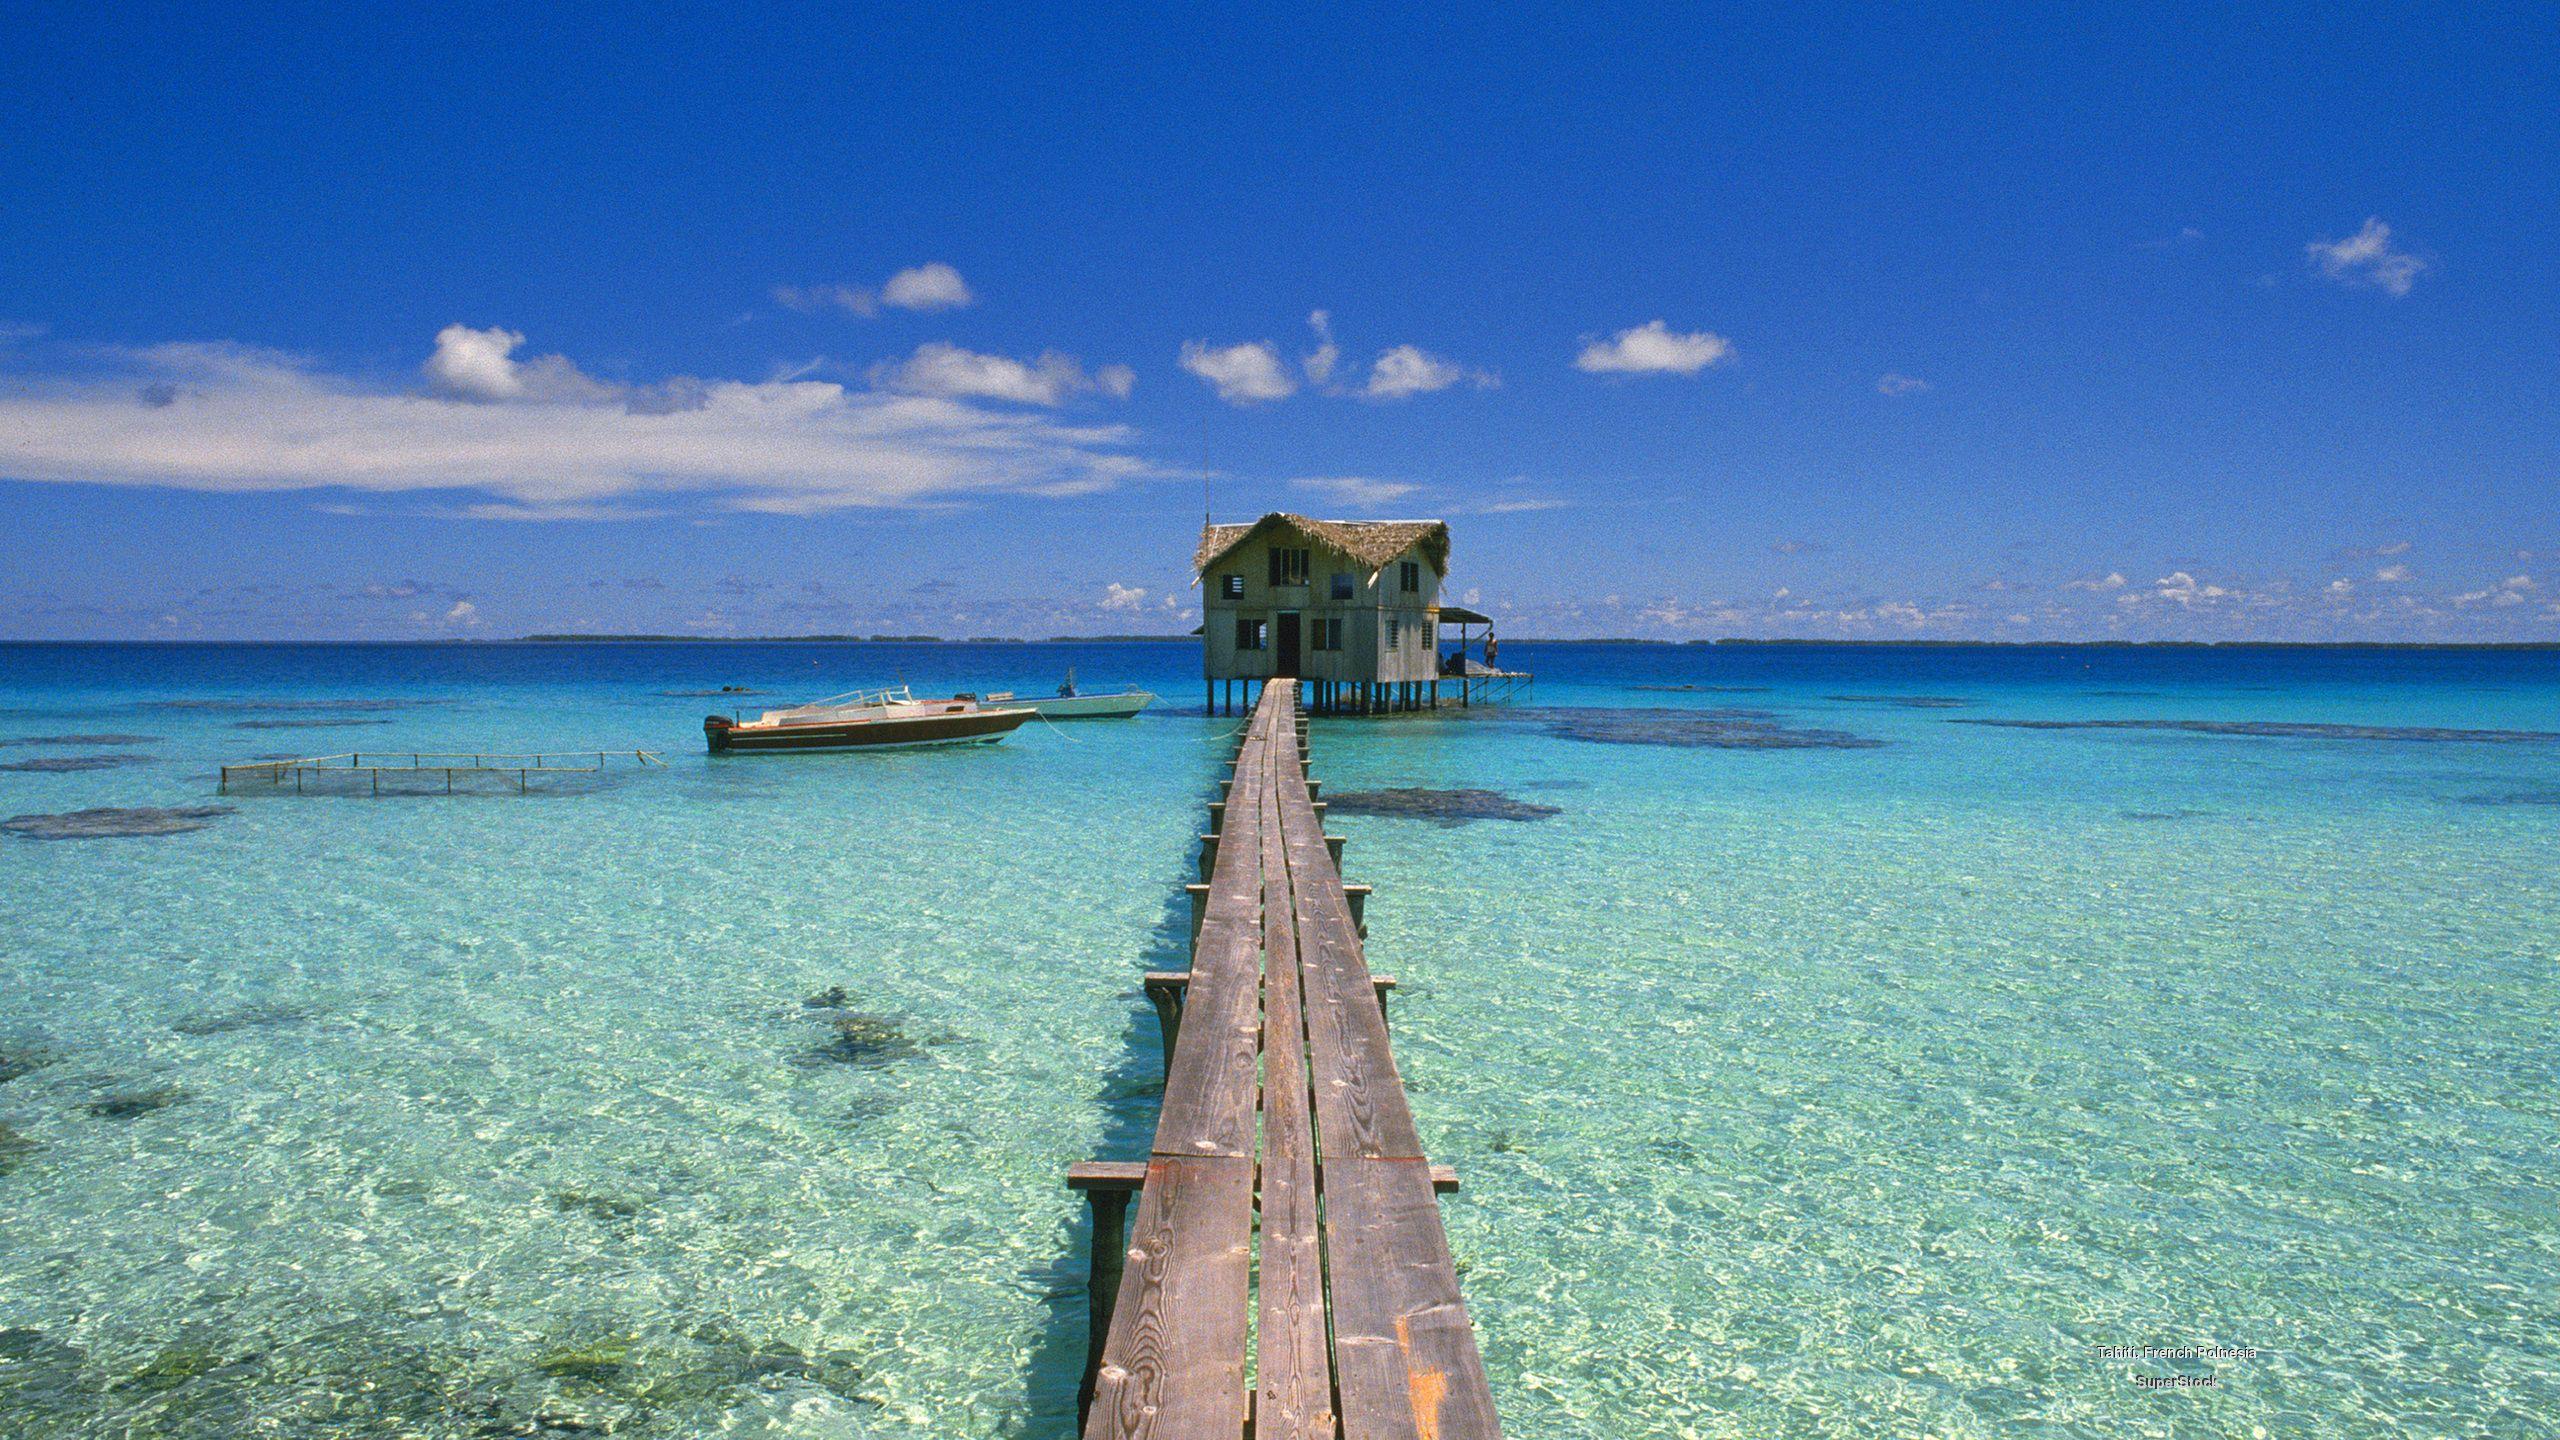 tahiti, french polnesia | islands | pinterest | tahiti, alaska and